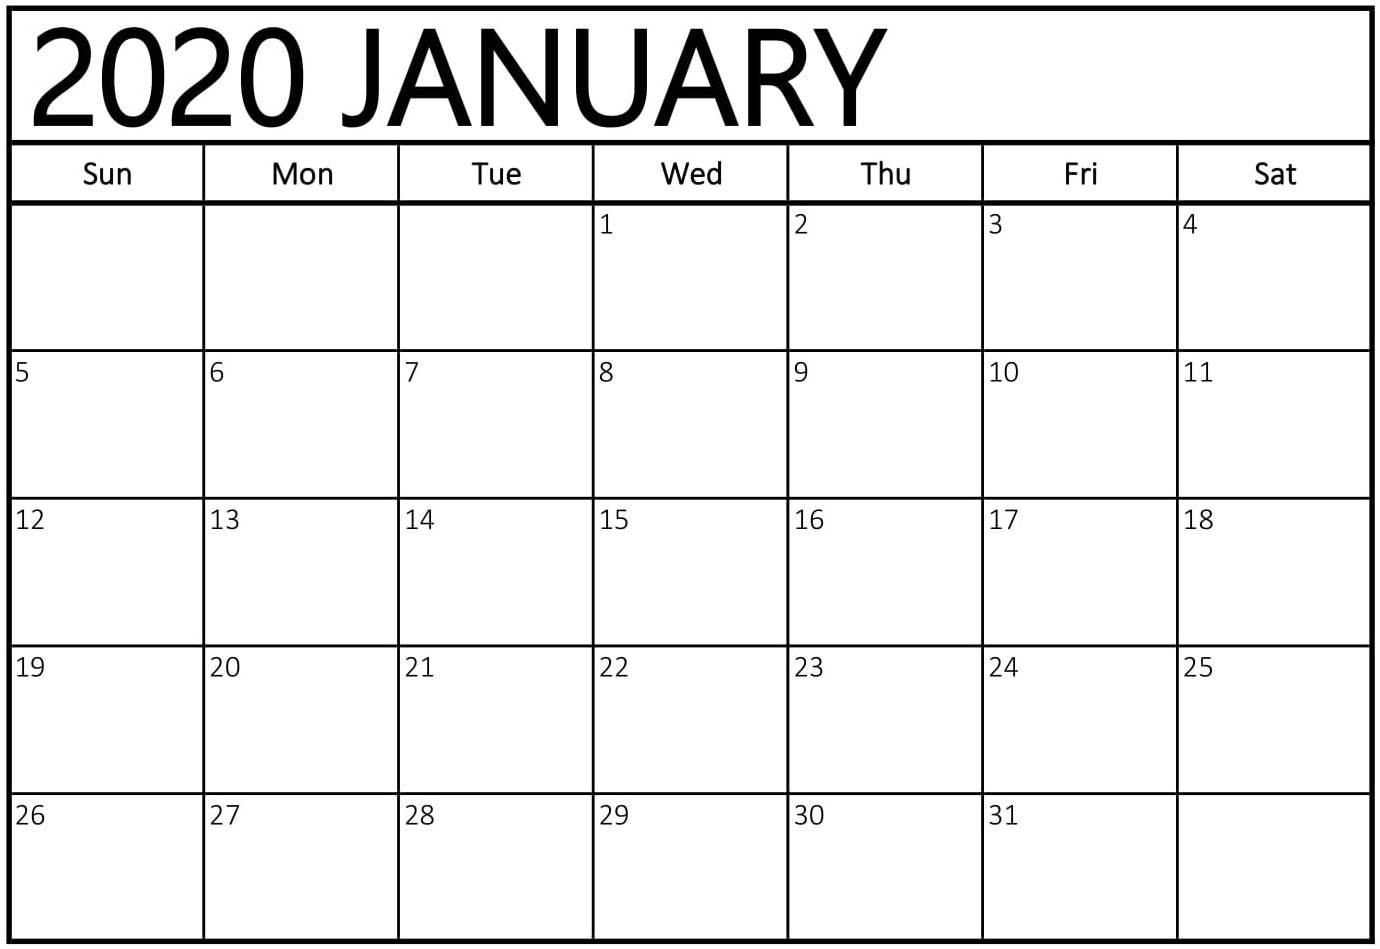 January 2020 Calendar New Zealand - Wpa.wpart.co